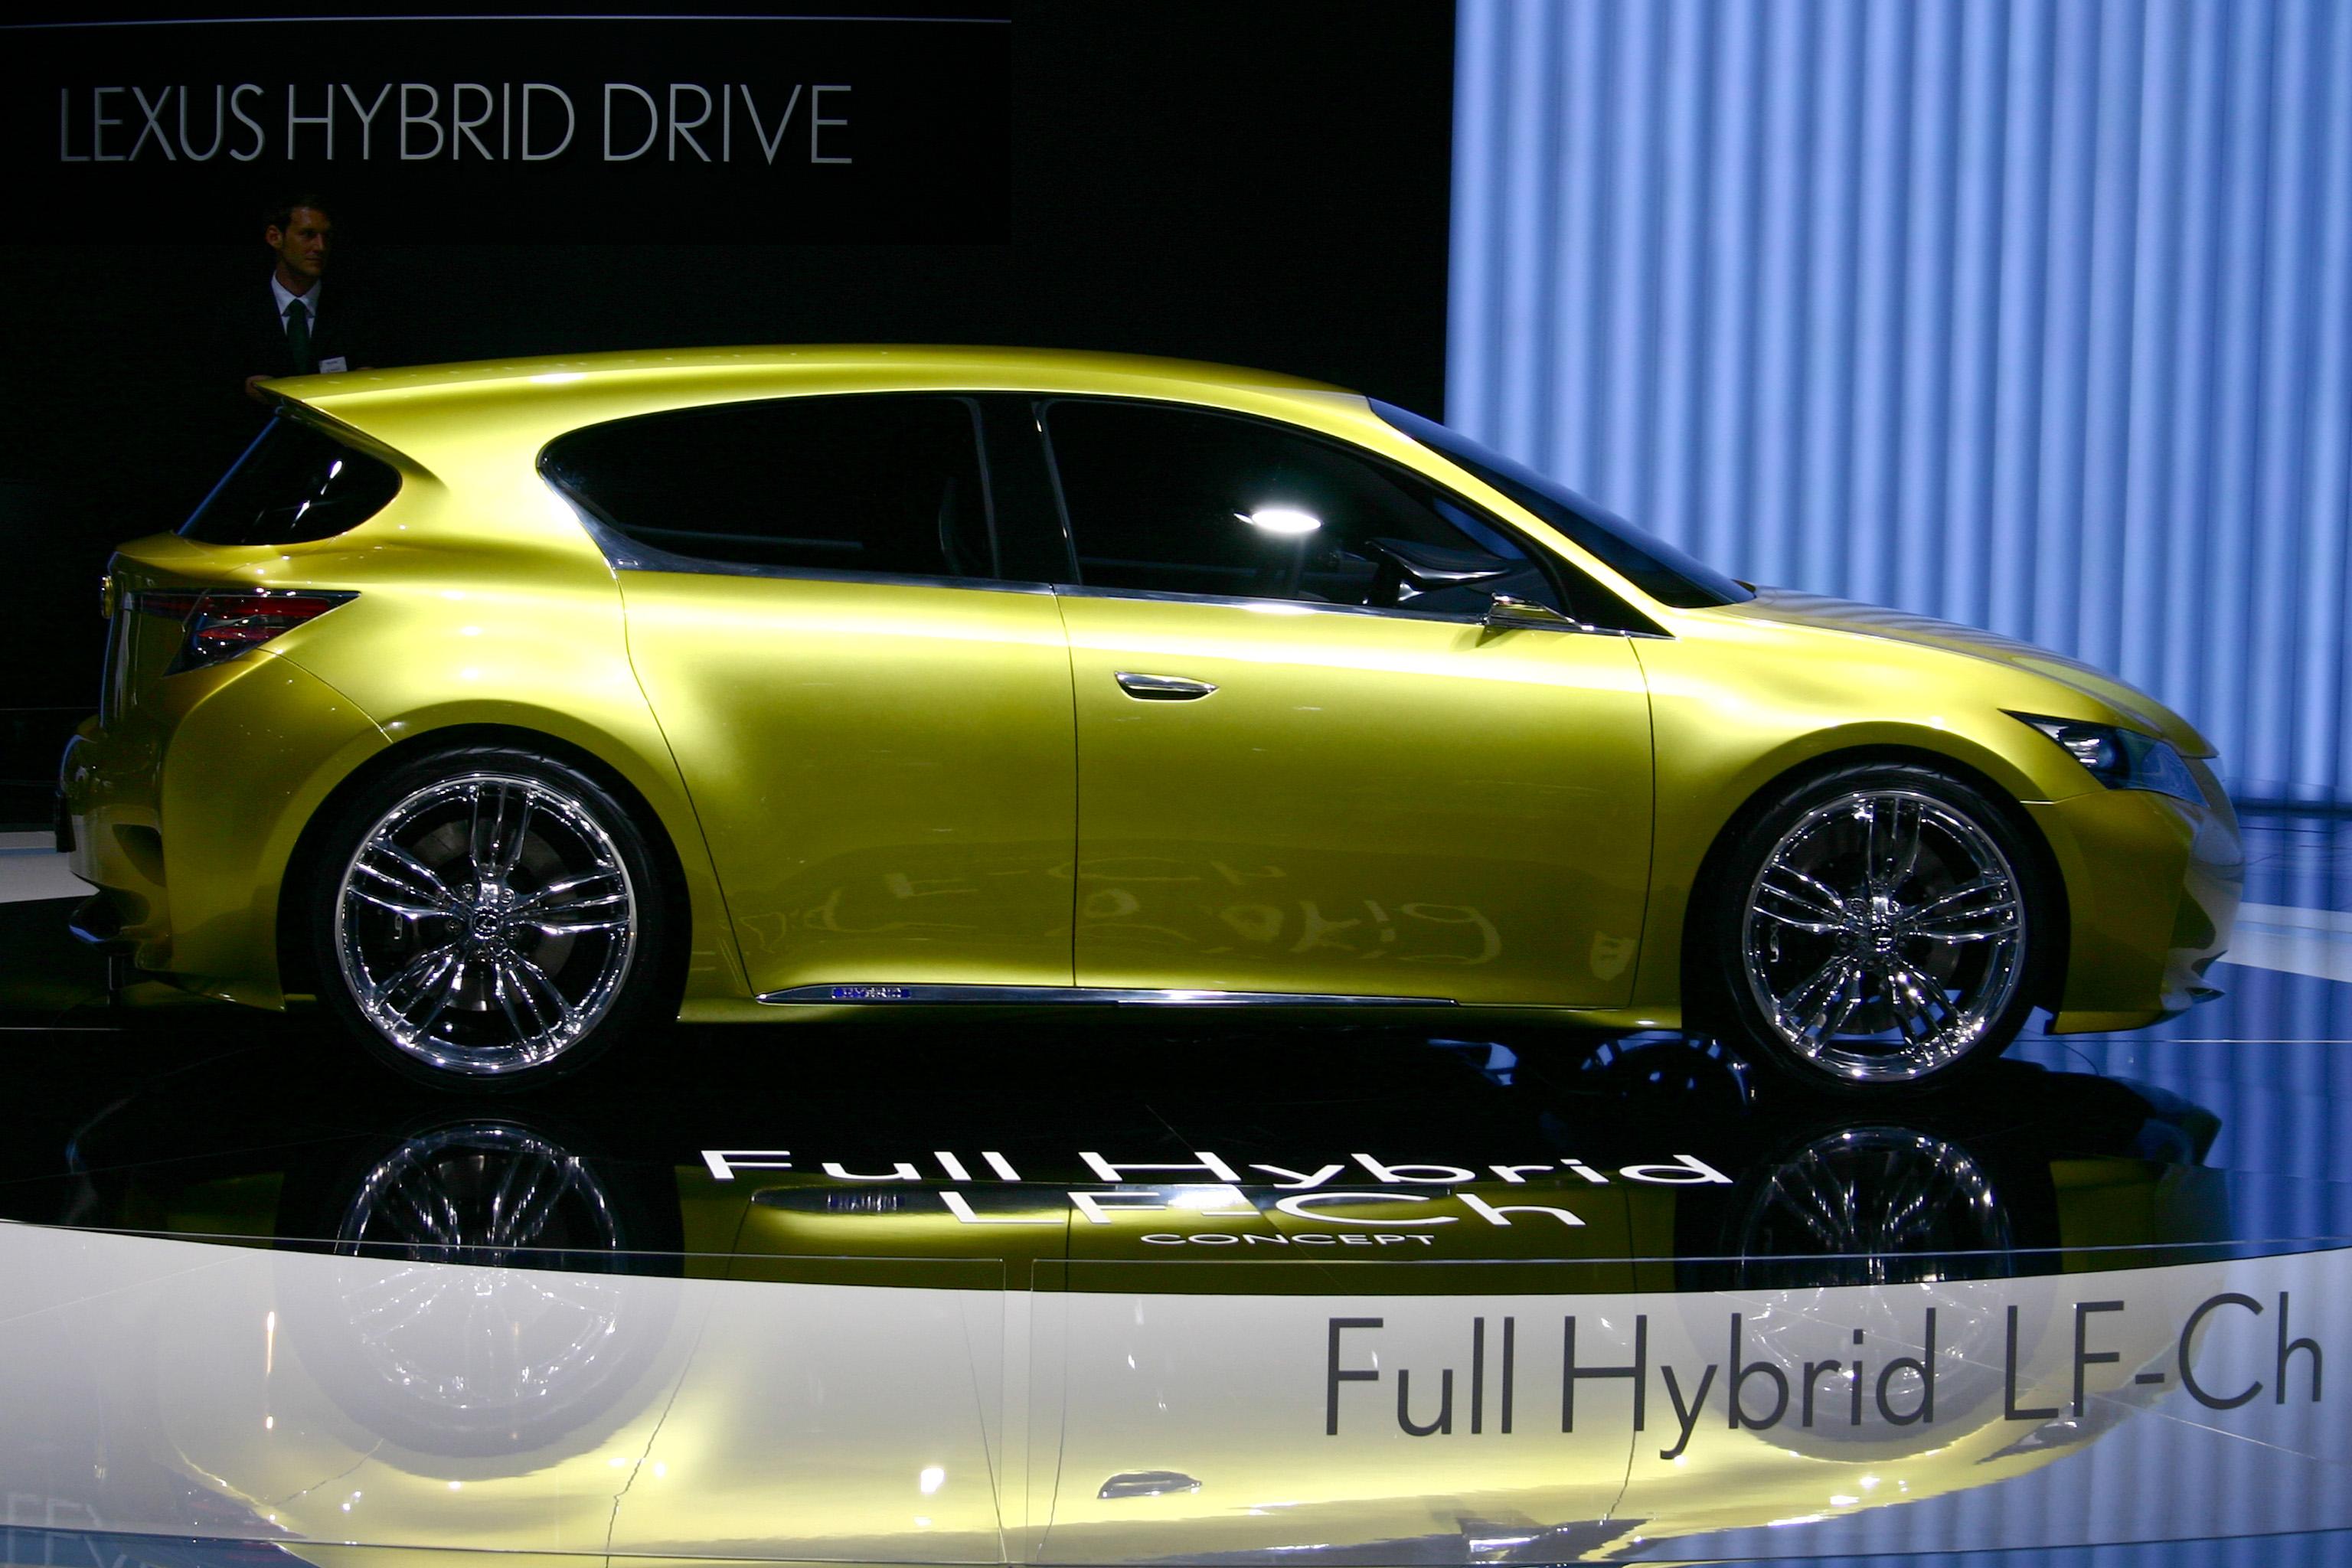 https://upload.wikimedia.org/wikipedia/commons/4/43/Lexus_LF-Ch_Hybrid_Concept_IAA_2009_02a.jpg